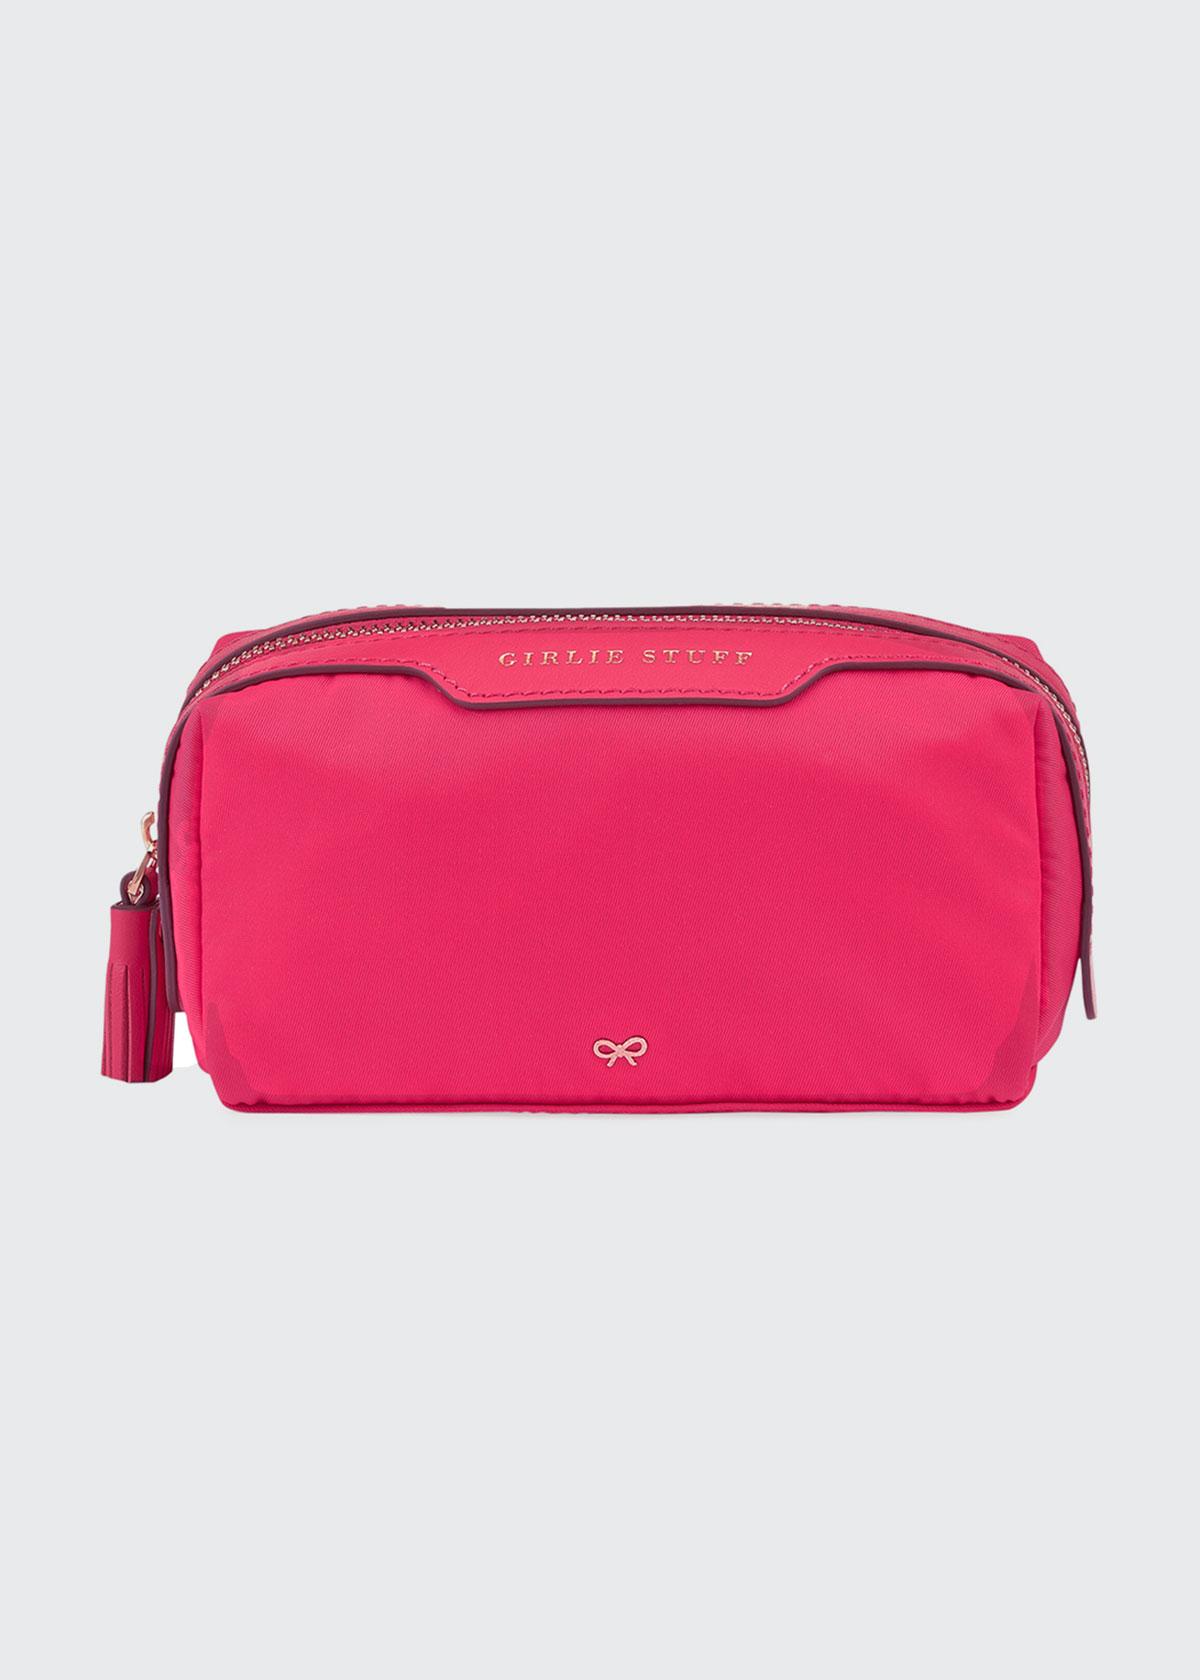 Anya Hindmarch Cosmetics cases Girlie Stuff Nylon Cosmetics Bag  Hot Pink